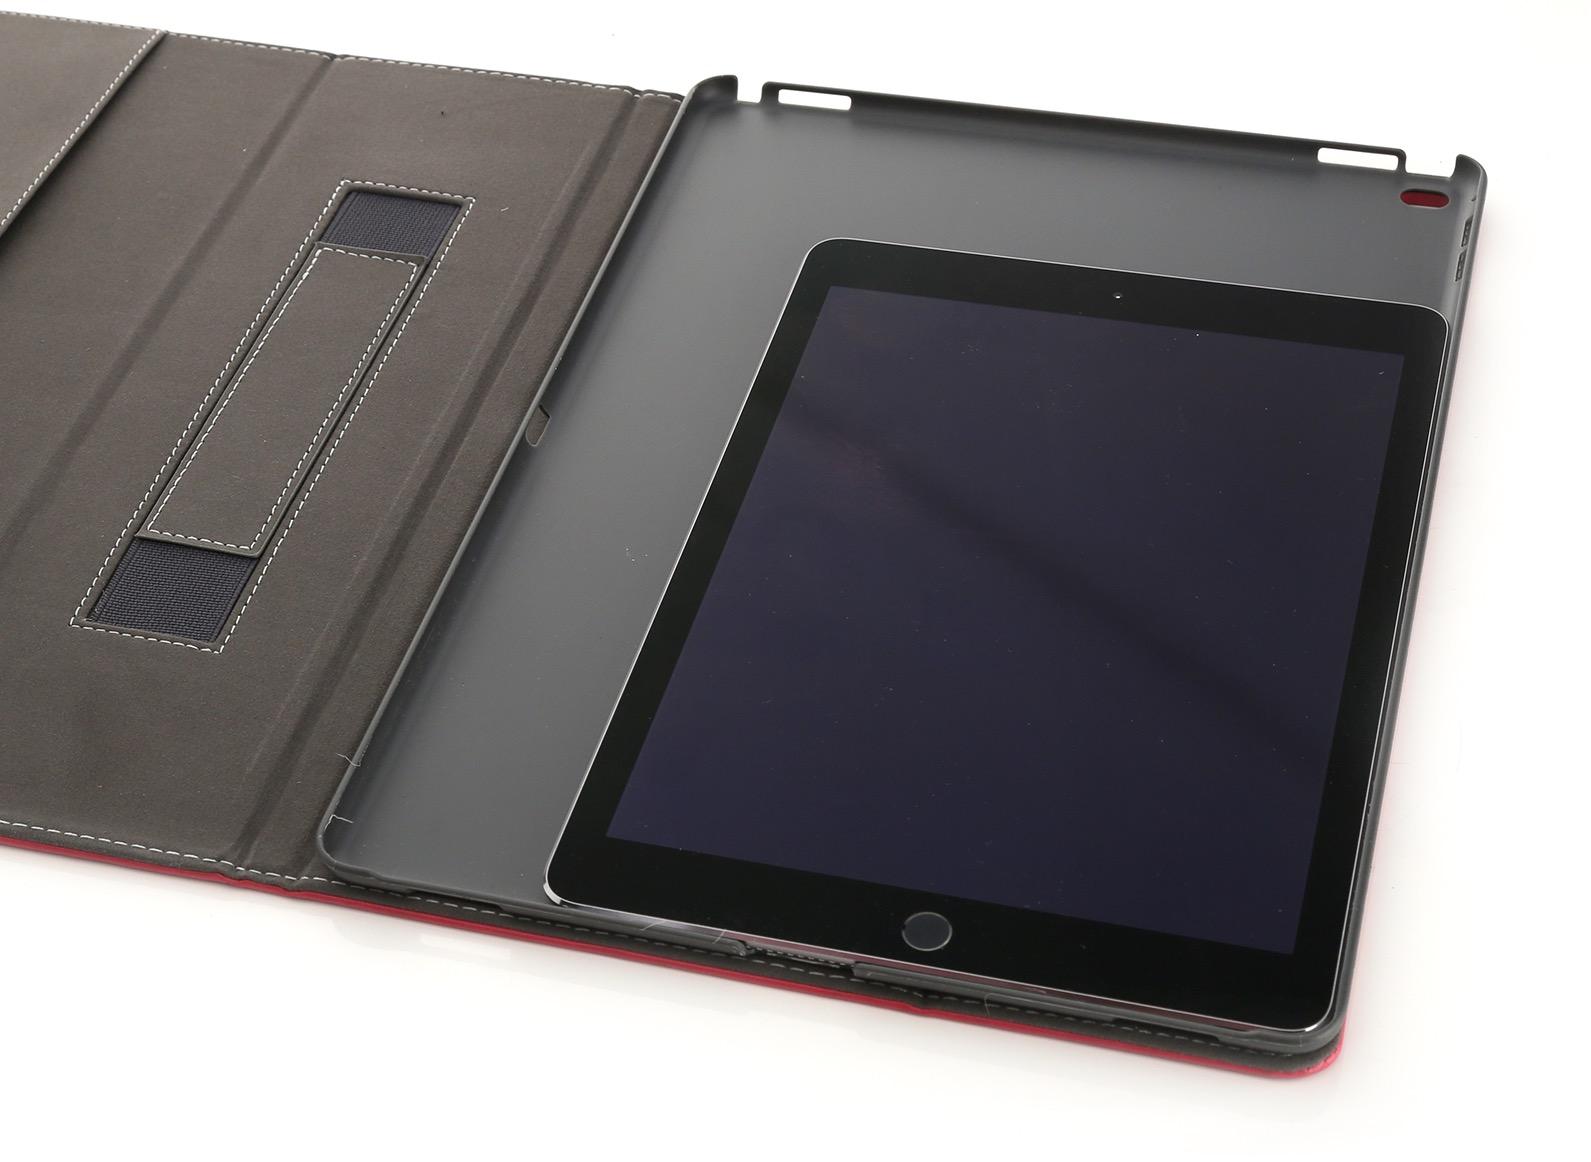 ipad-pro-vs-ipad-air-2-size-2